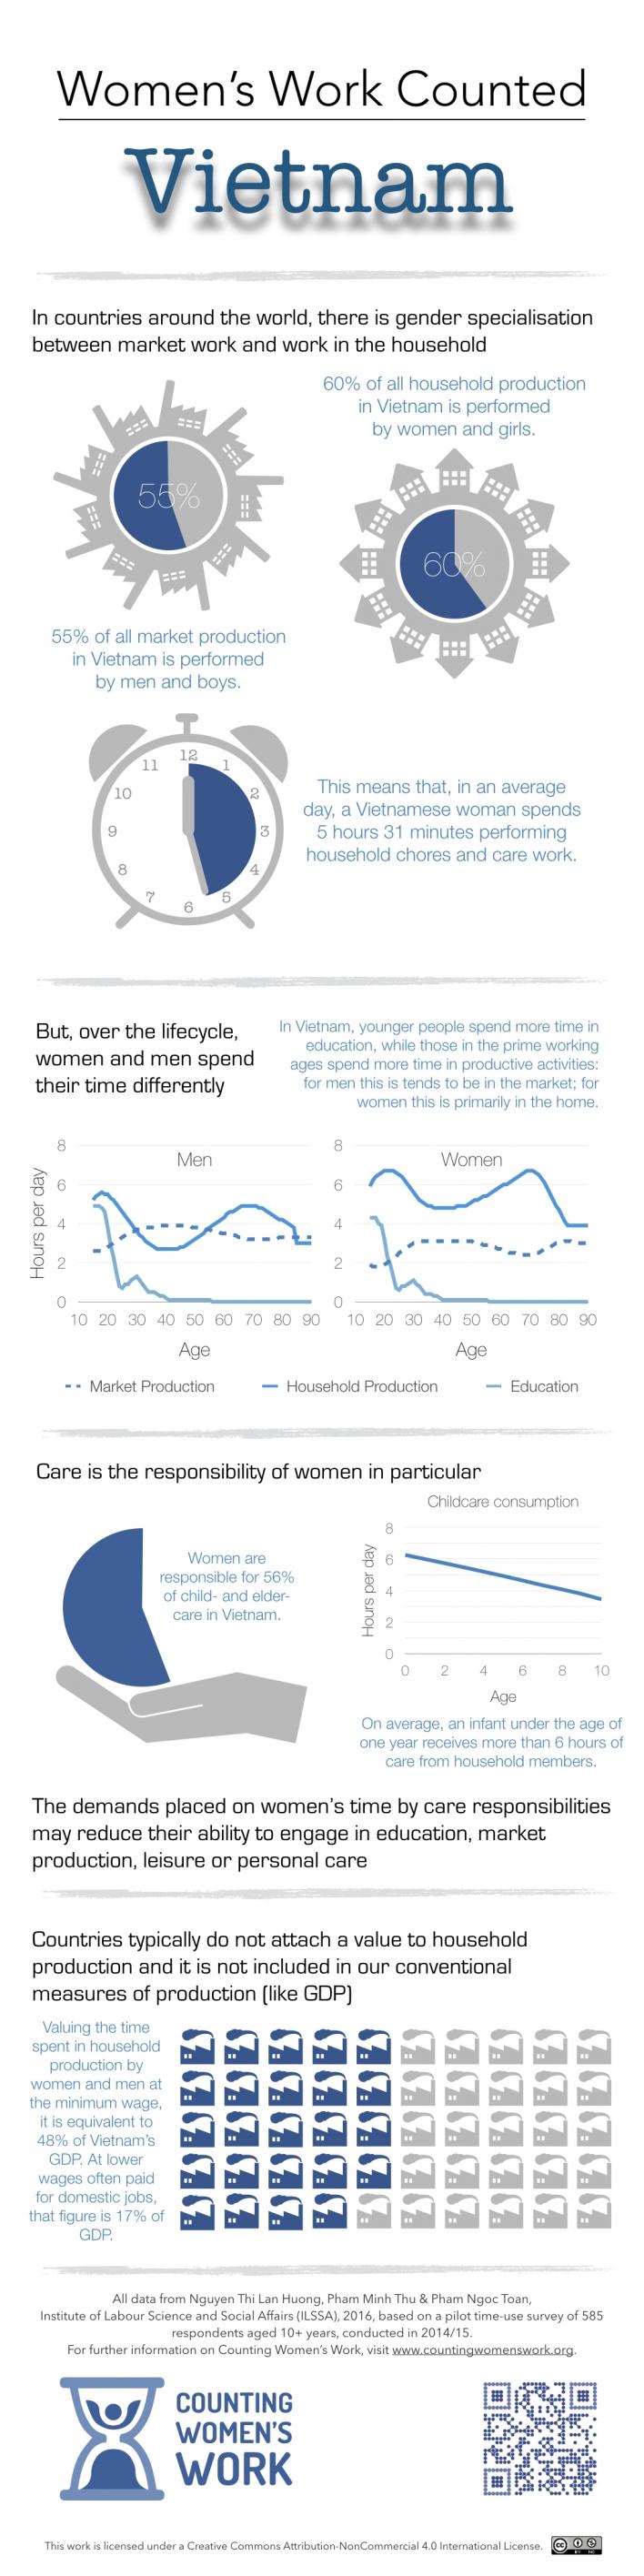 2017-05-19 VN Infographic.jpeg